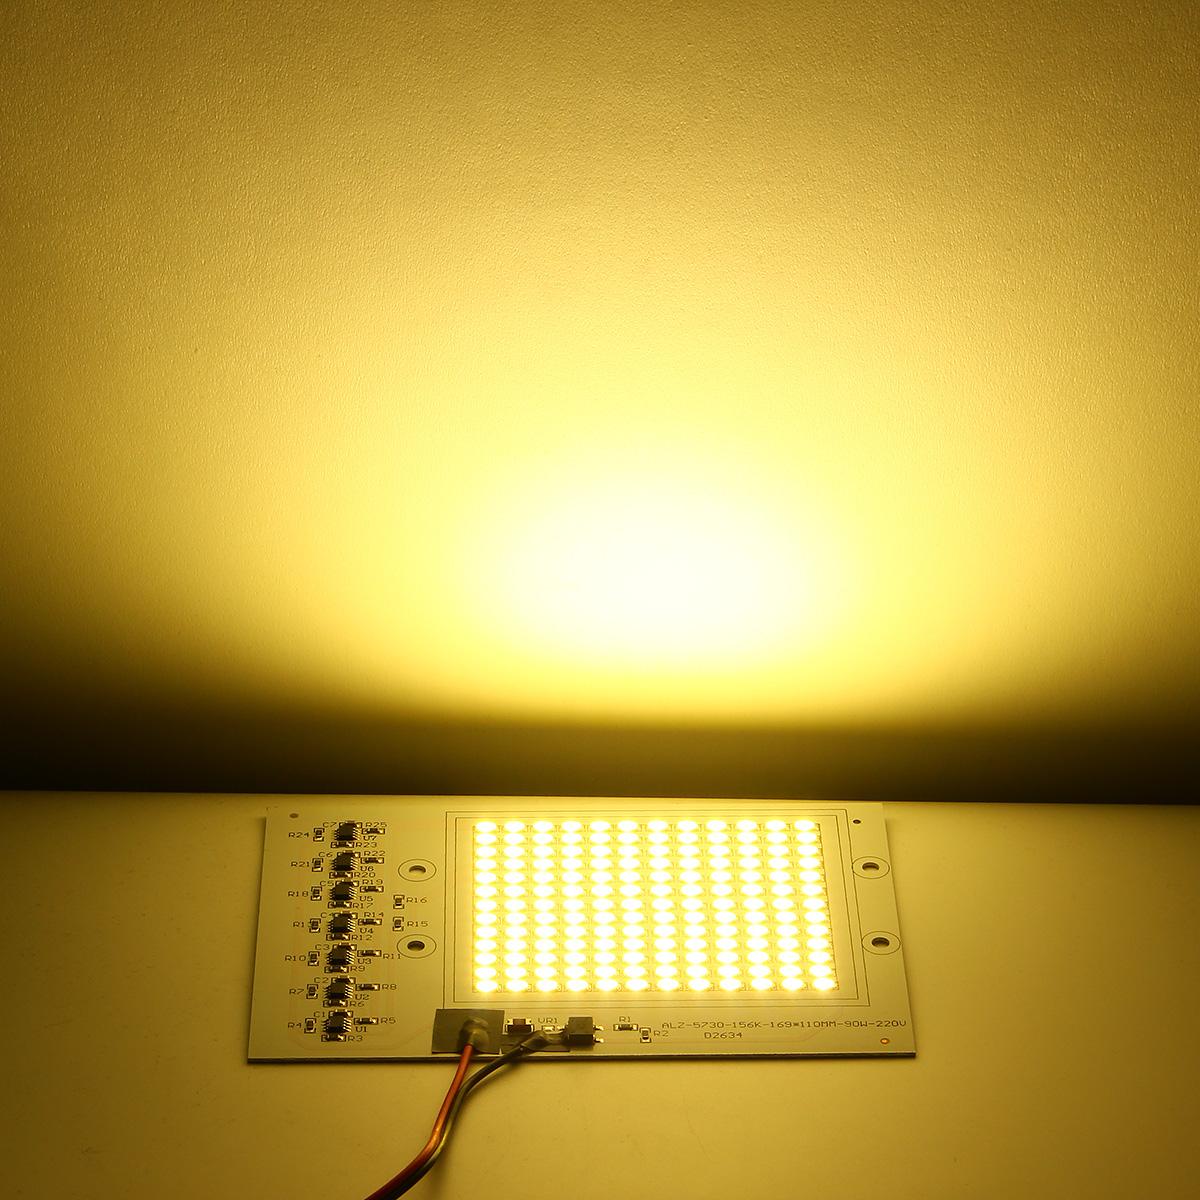 90W SMD5730 Outdoor Smart IC LED COB Chip Bead DIY Floodlight Lamp 220V